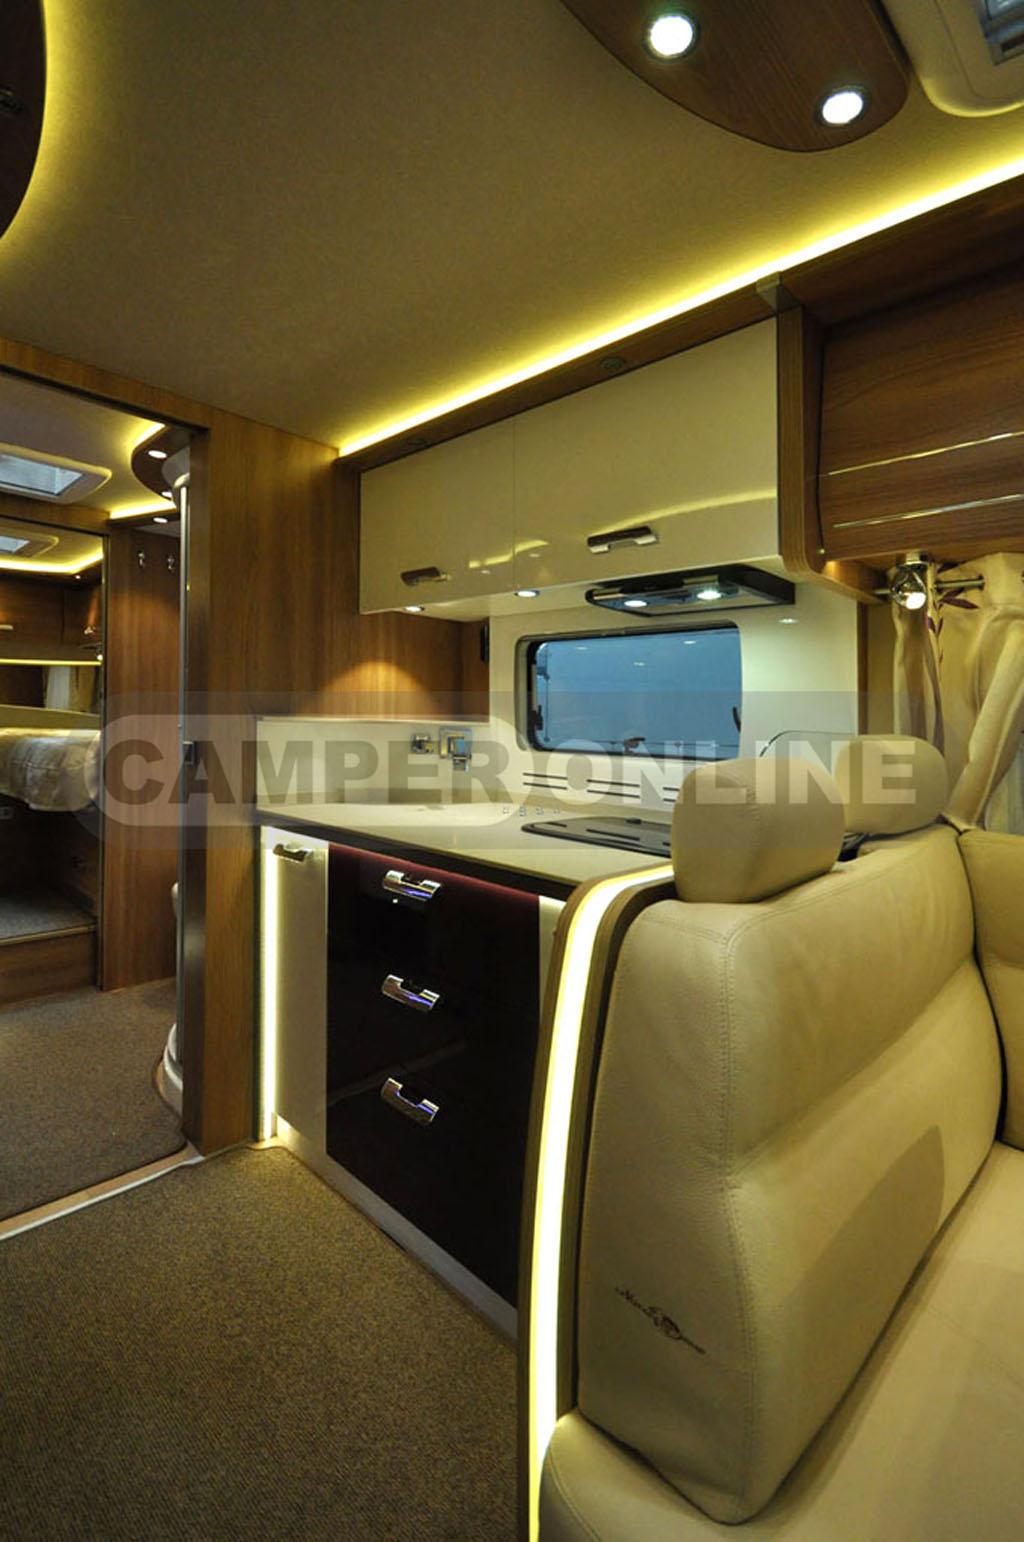 Caravan-Salon-2014-RMB-032